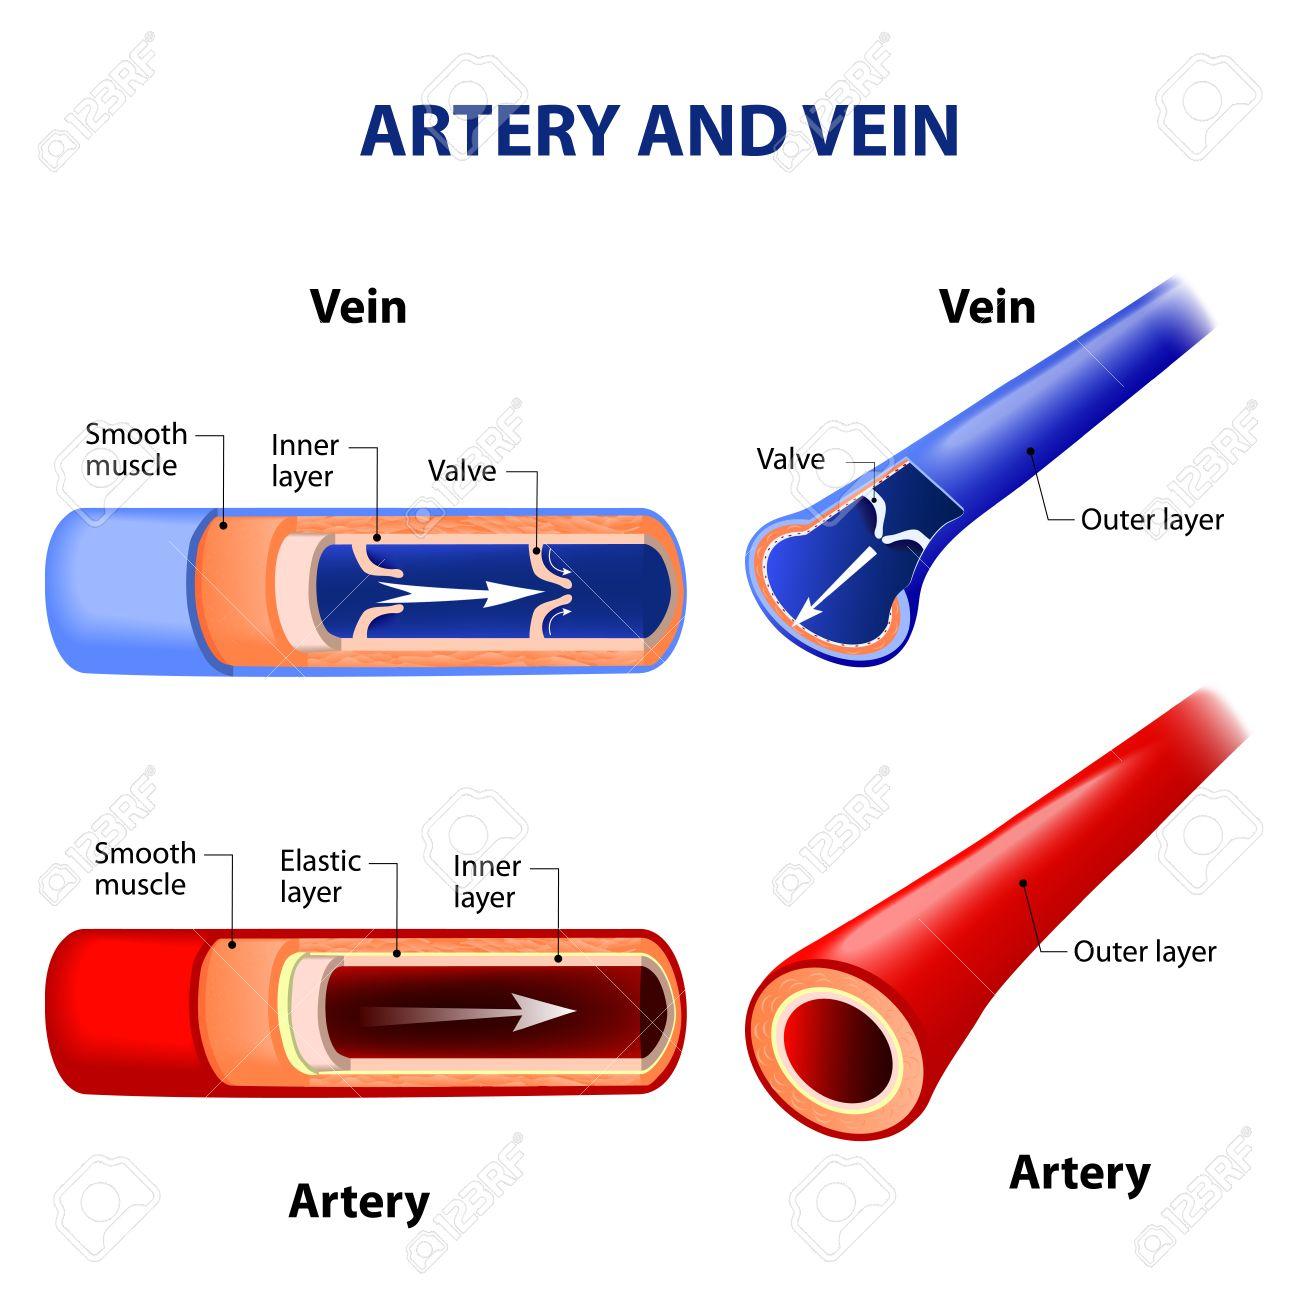 Circulatory System Stock Photos. Royalty Free Circulatory System Images